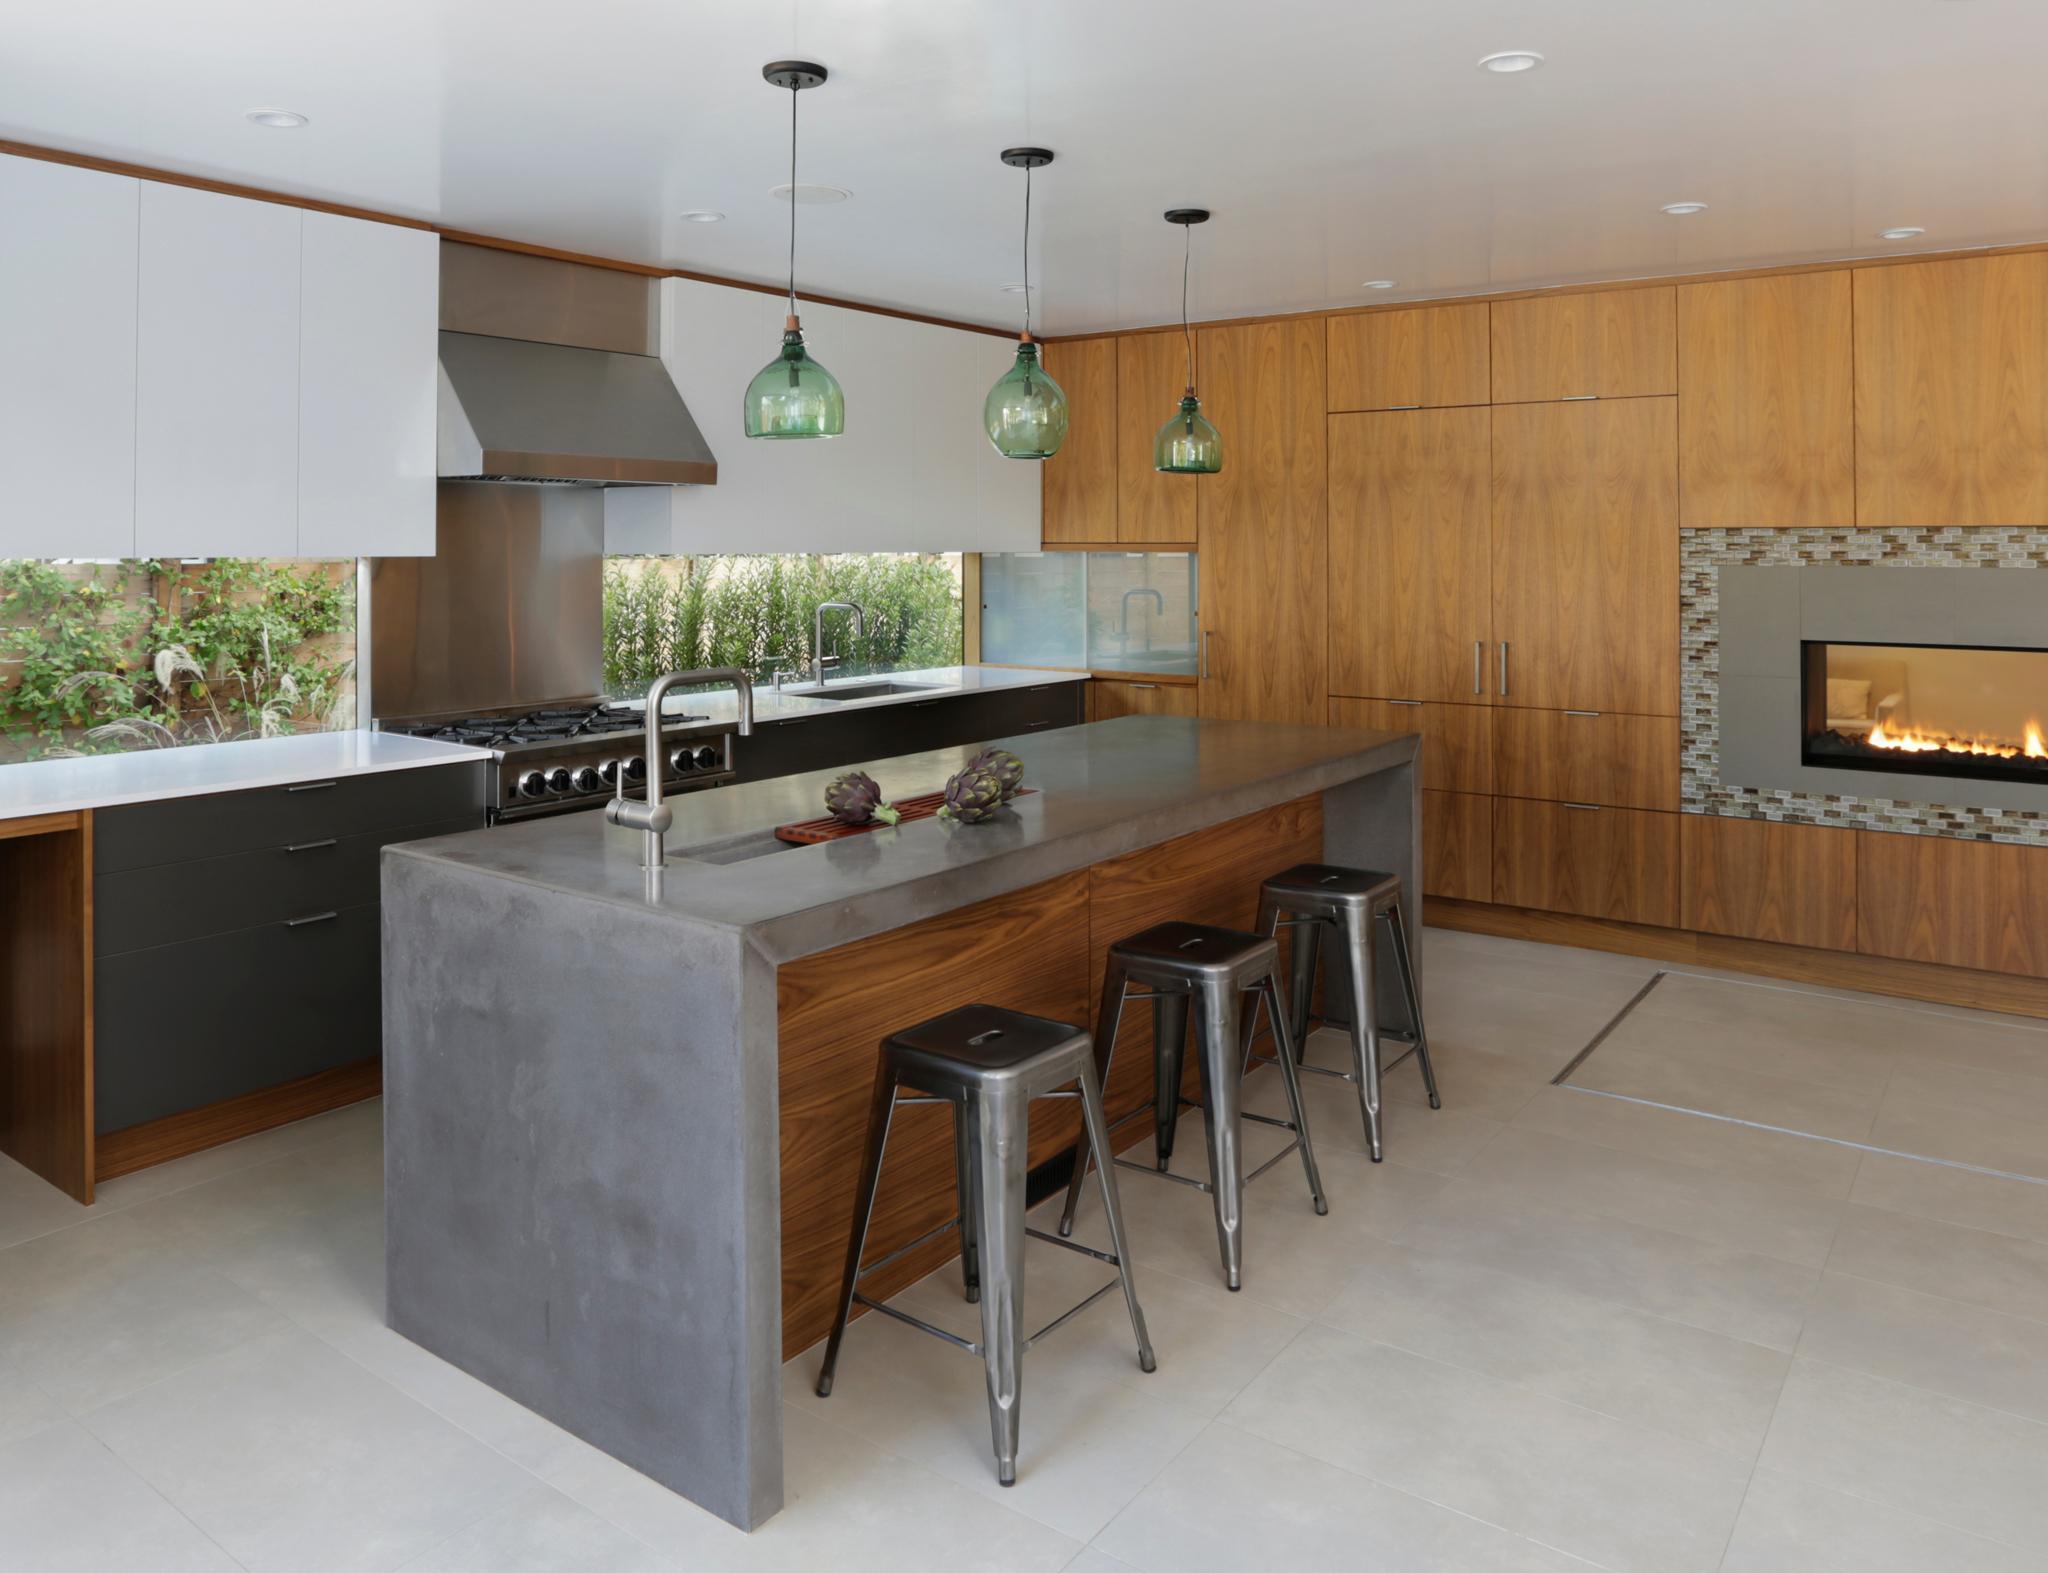 Senca_kitchen1.jpg